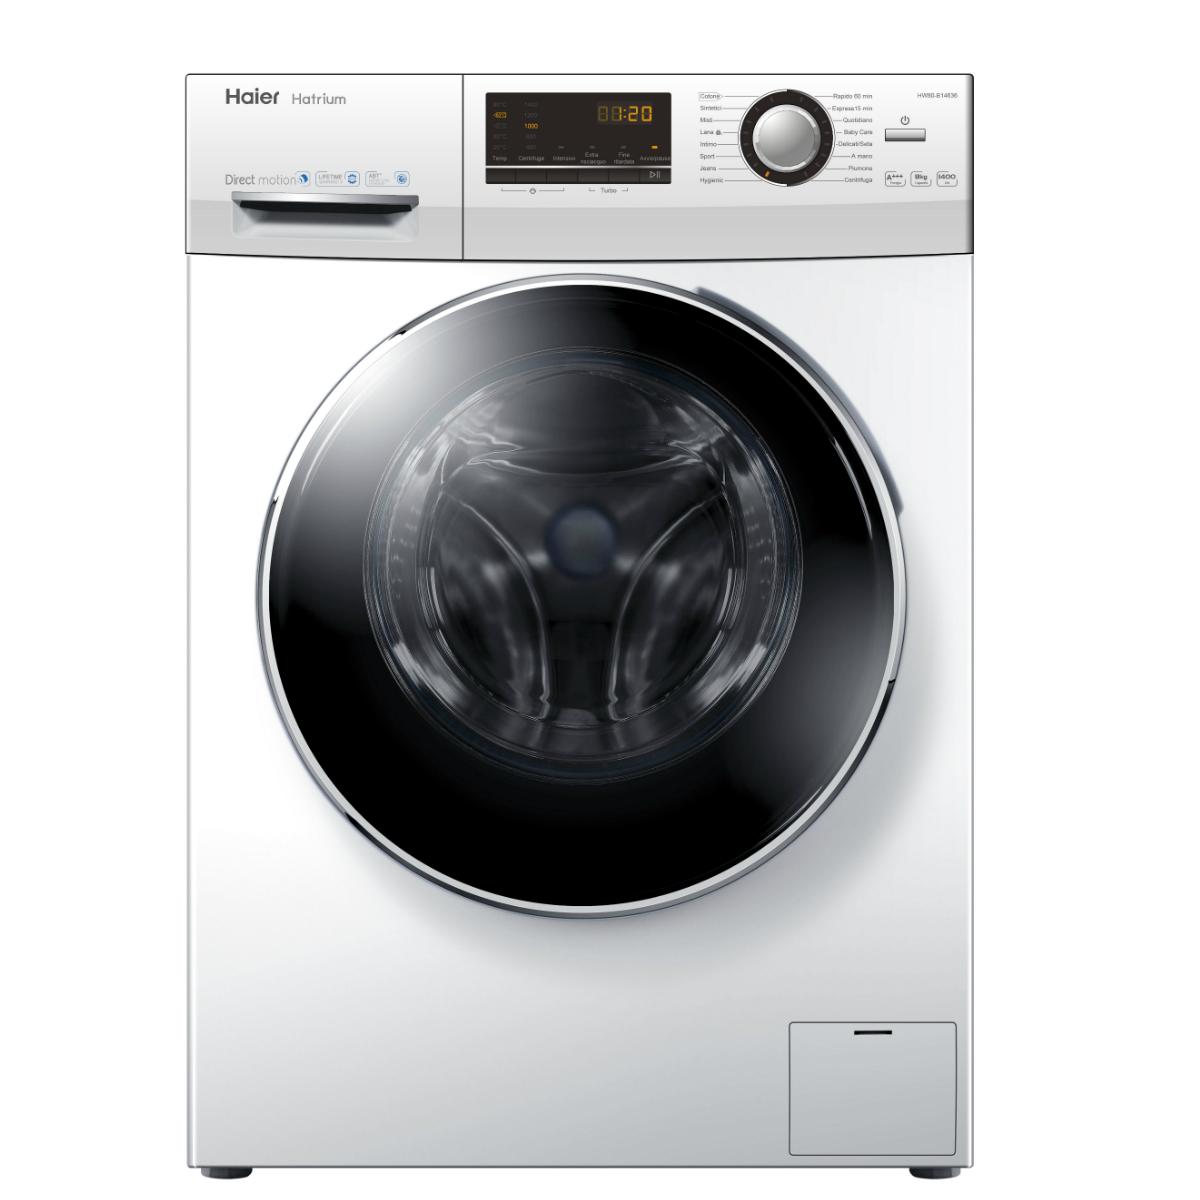 Lavatrice haier hw80 b14636 caratteristiche lavatrice - Lavatrice altezza 75 ...